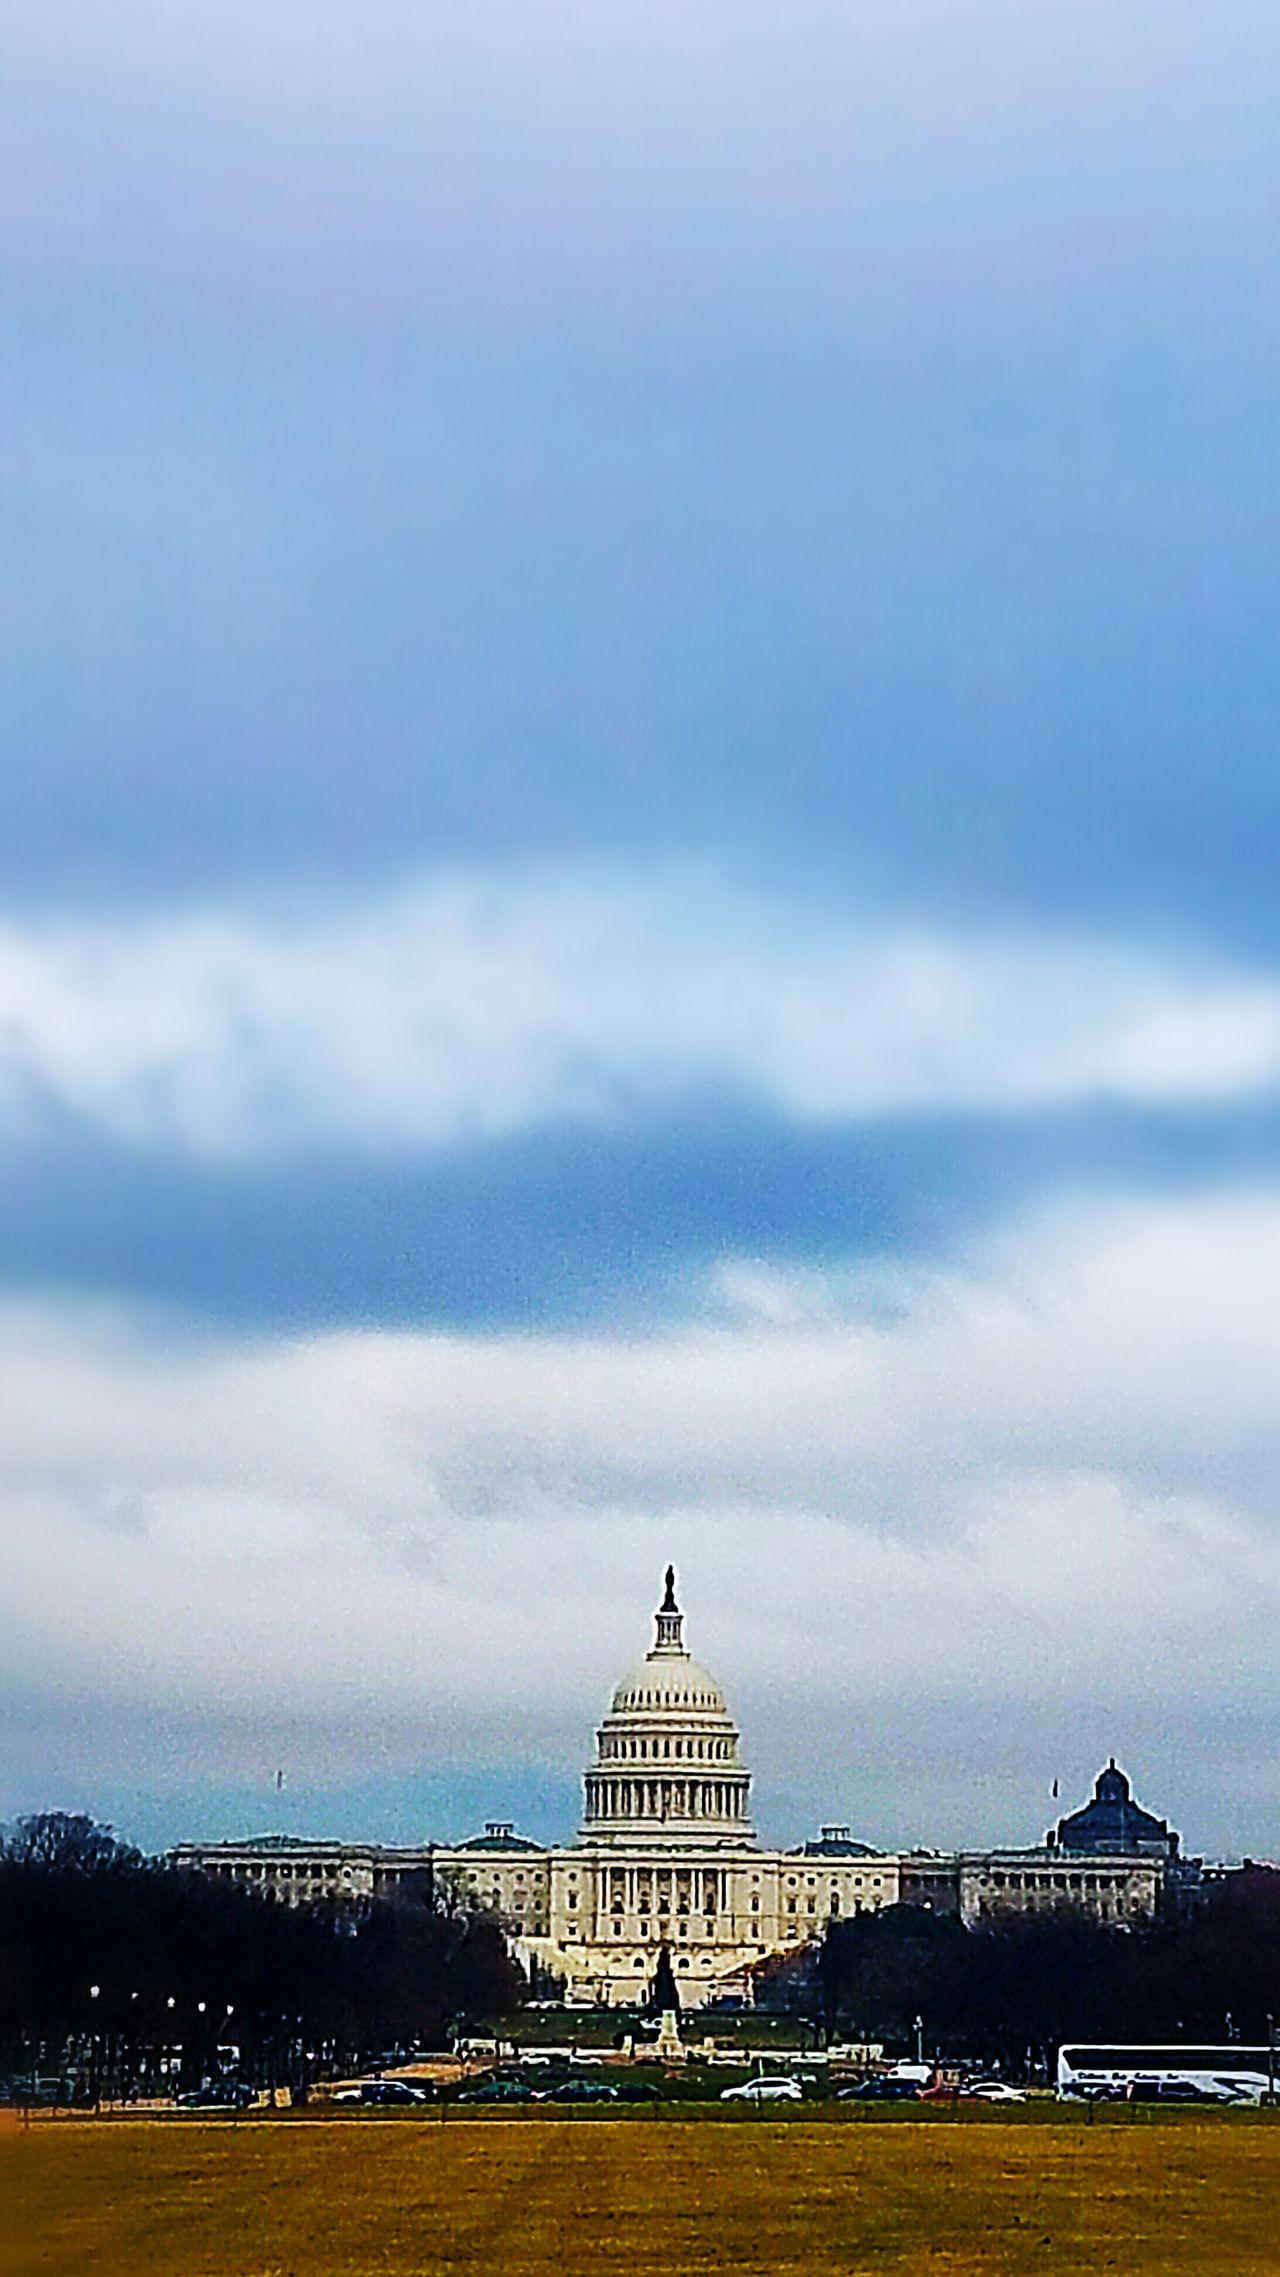 Sky Architecture City Cloud - Sky Government Building Exterior Travel Destinations Dramatic Sky Outdoors Cityscape WashingtonDC Washington DC Senate House Senate Square Washington, D. C. Washington, D.C. Architecture CapitolHill Capitol Building